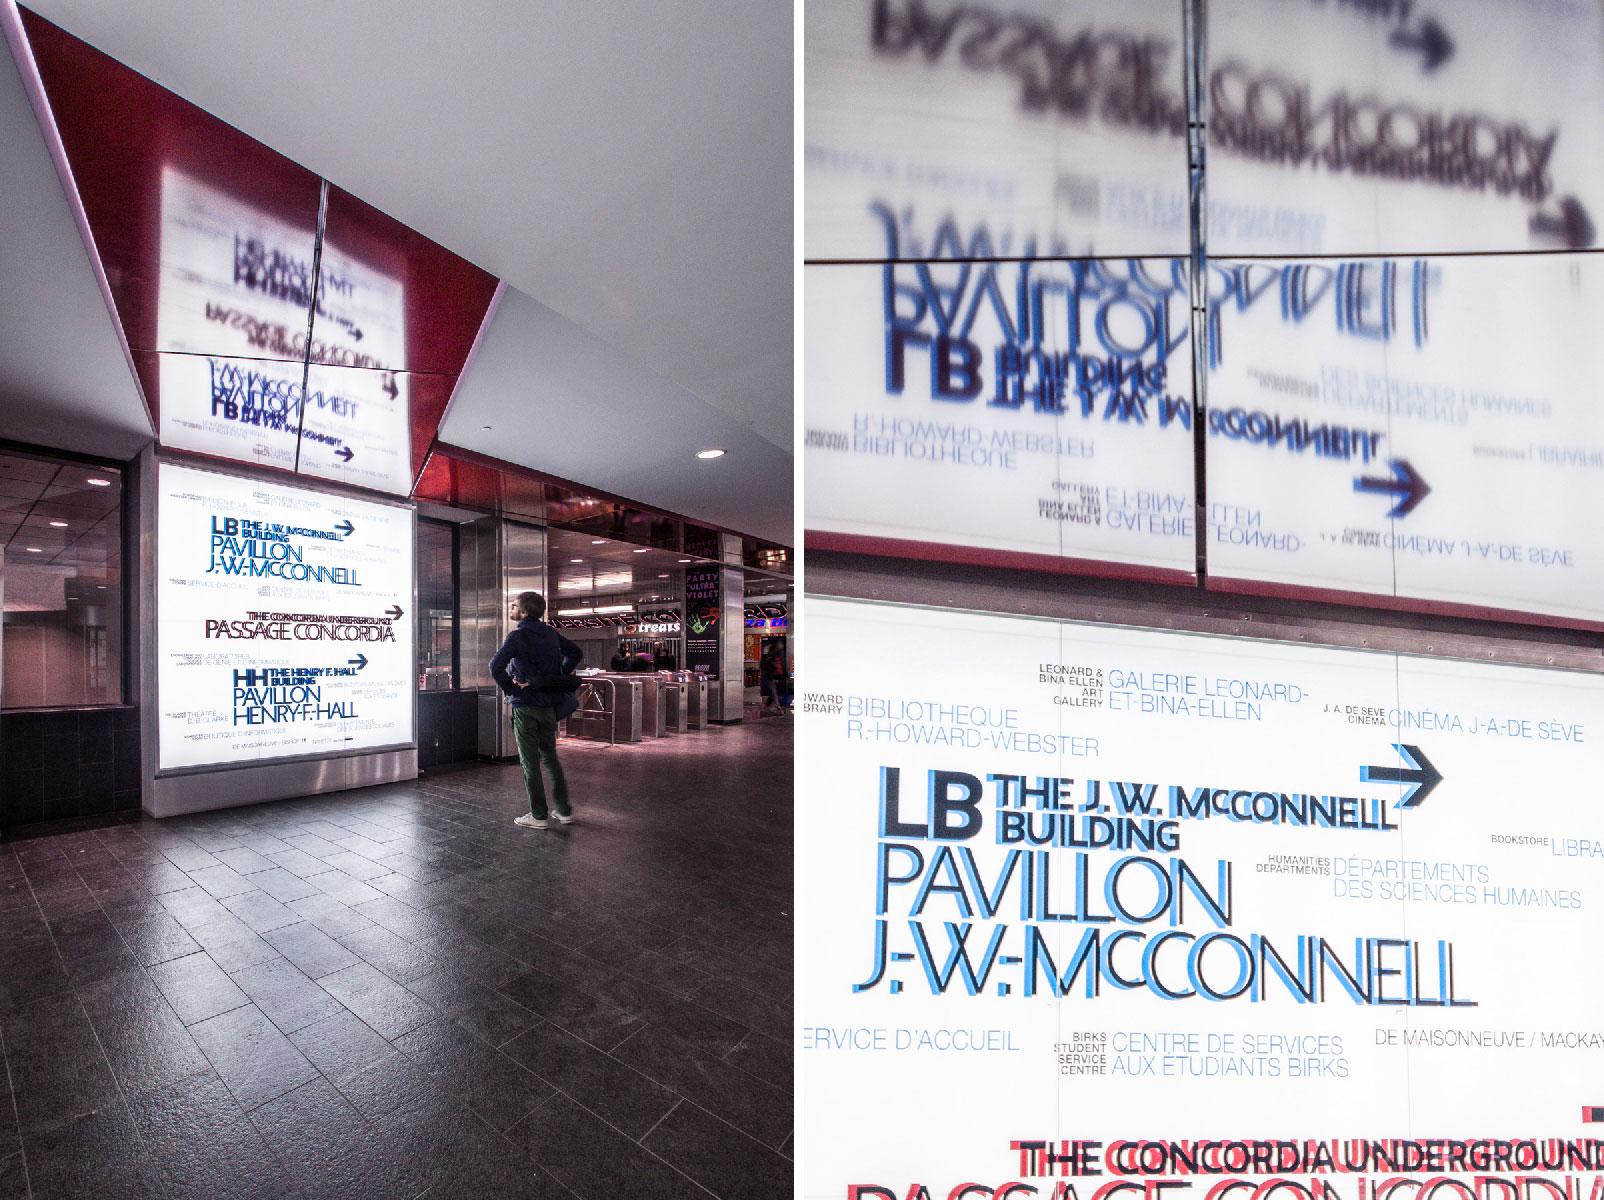 Affichage U. Concordia / Intégral Jean Beaudoin © Raphaël Thibodeau